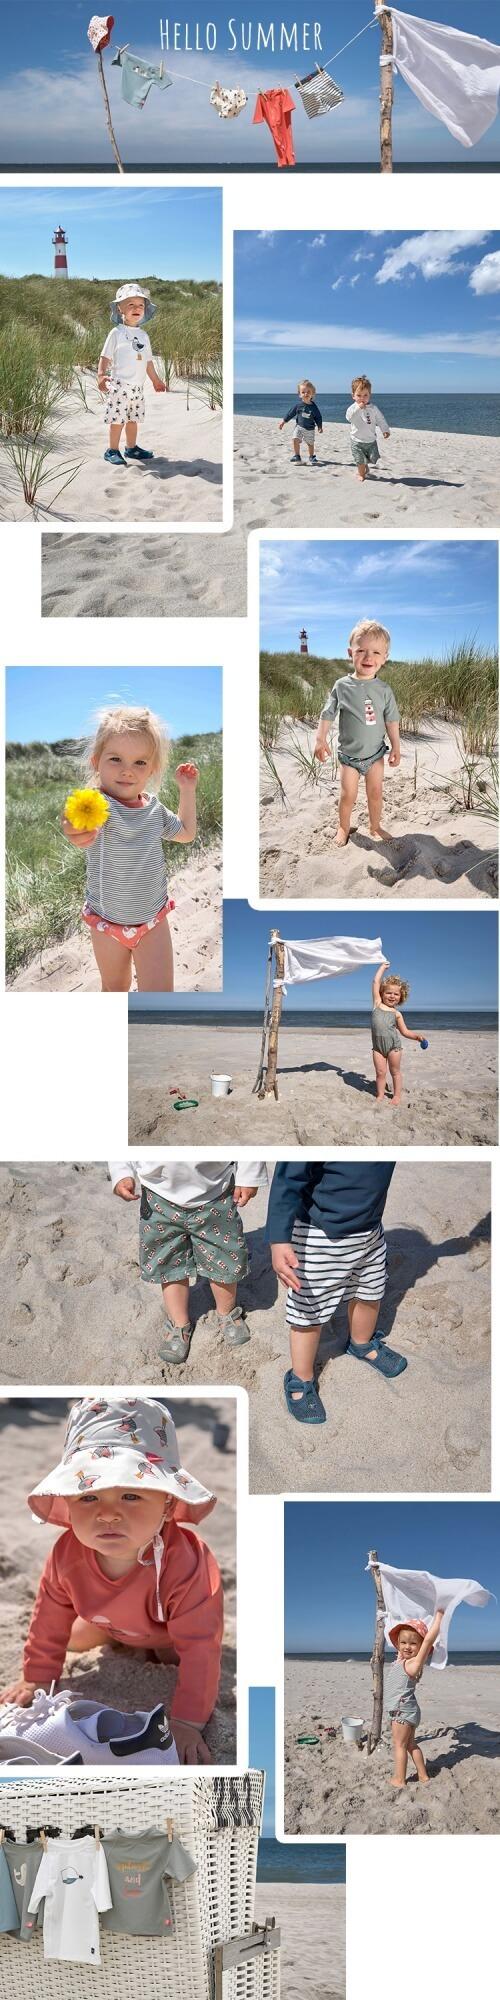 LASSIG嬰兒游泳尿布褲,獨家超強三層導流,外層防水,內層吸濕透氣不回滲,不須再穿尿布!兒童泳衣多款式可挑選,透氣快乾防曬抗UV紫外線,材質安全無毒